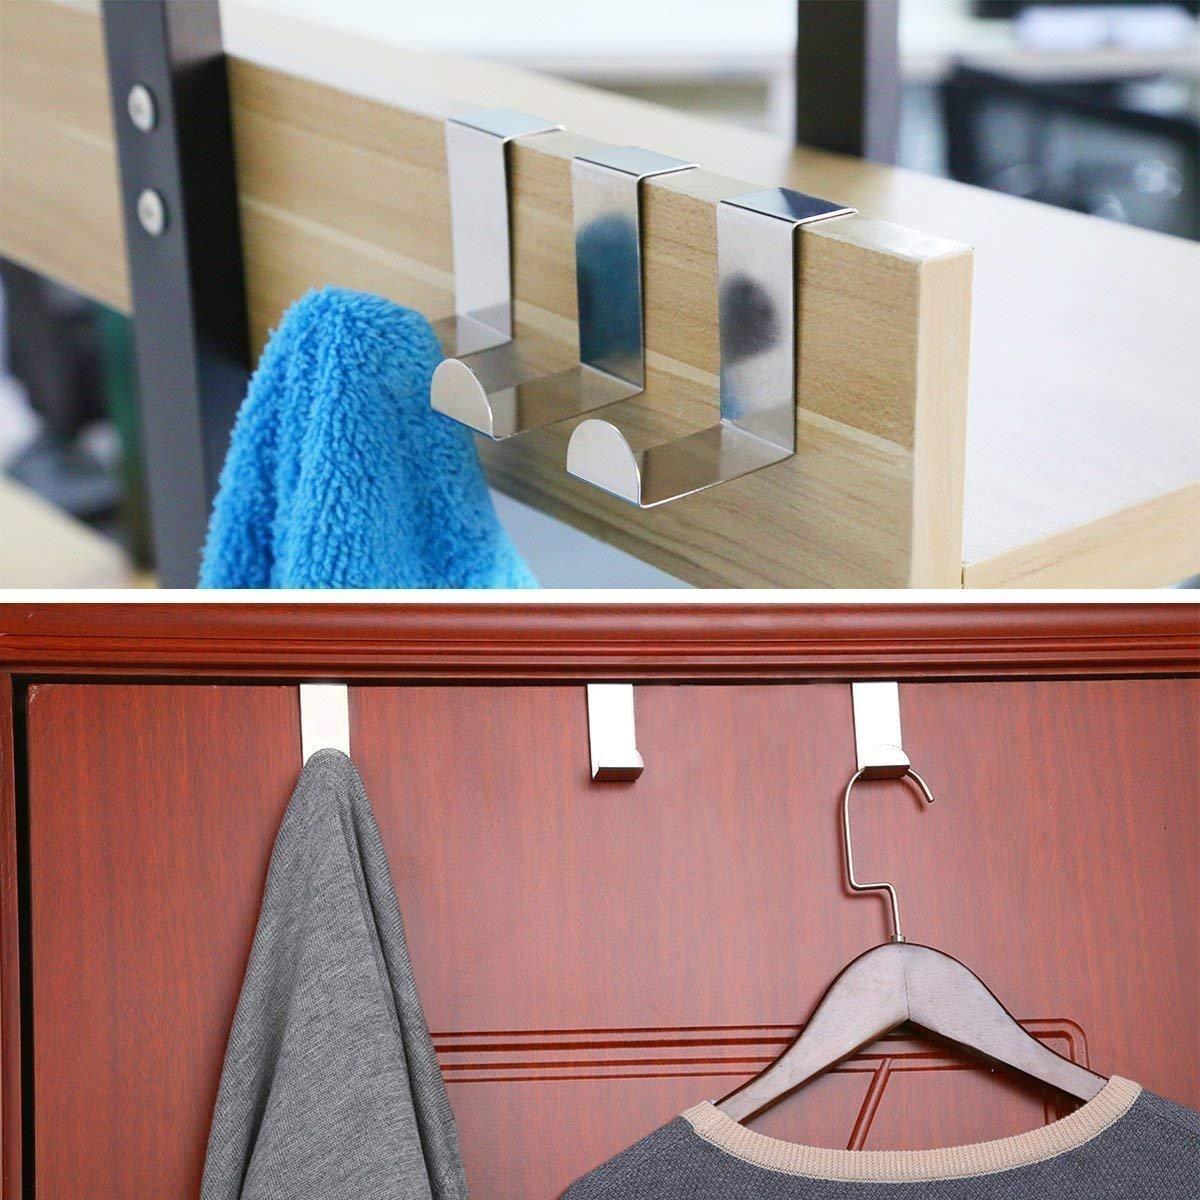 Bathroom Over The Door Hooks Hanging Towel Rack 2 Pack, M Office Storage Organizer 18//8 Stainless Steel Multiple Use Z Shaped Cabinet Door Hooks Use Kitchen Bedroom